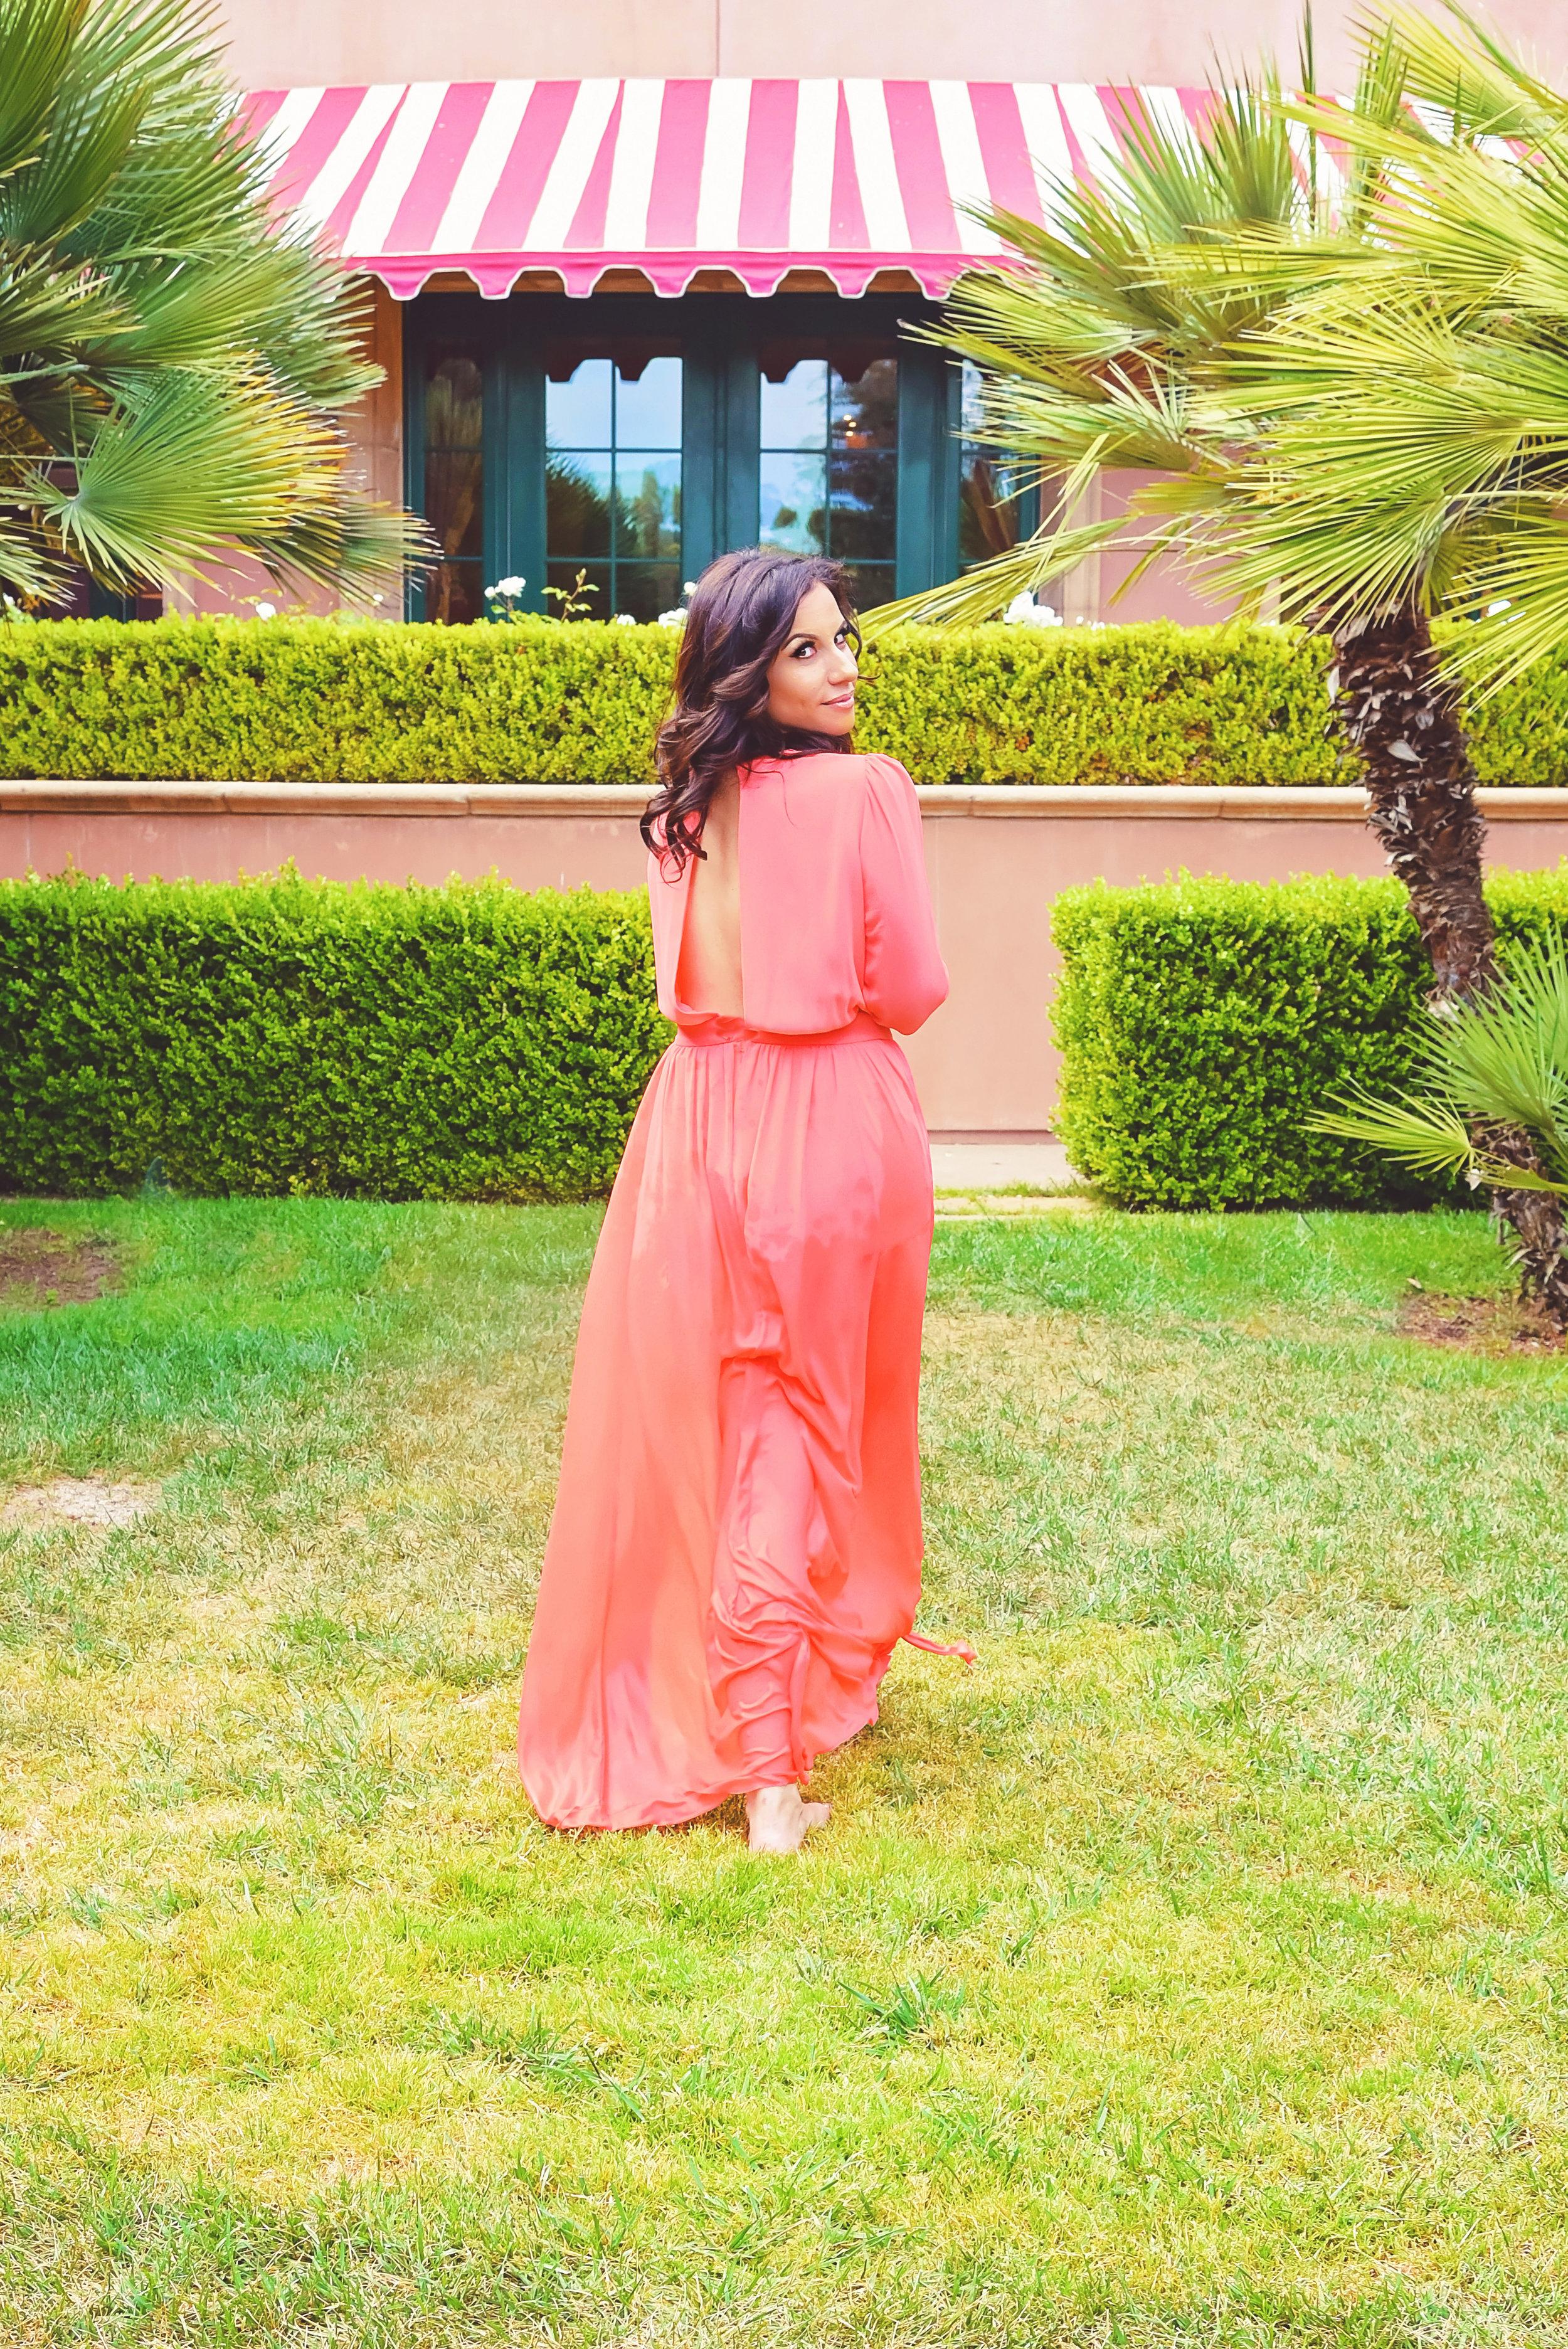 Fashion Pink Dress | Fashion Photography | Lacey O